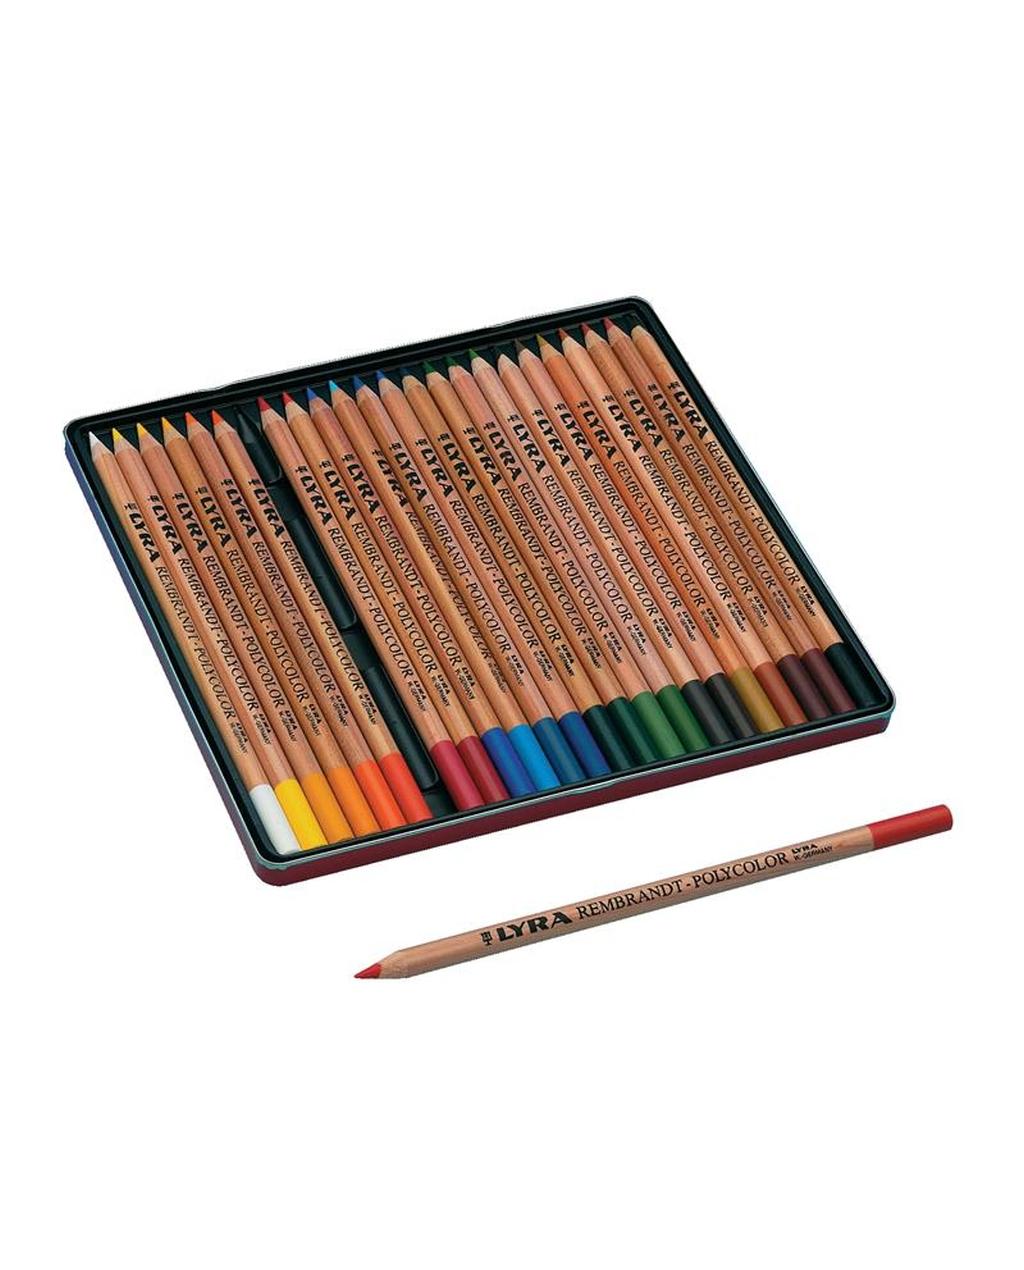 Lyra Rembrandt Polycolour Artists Pencils